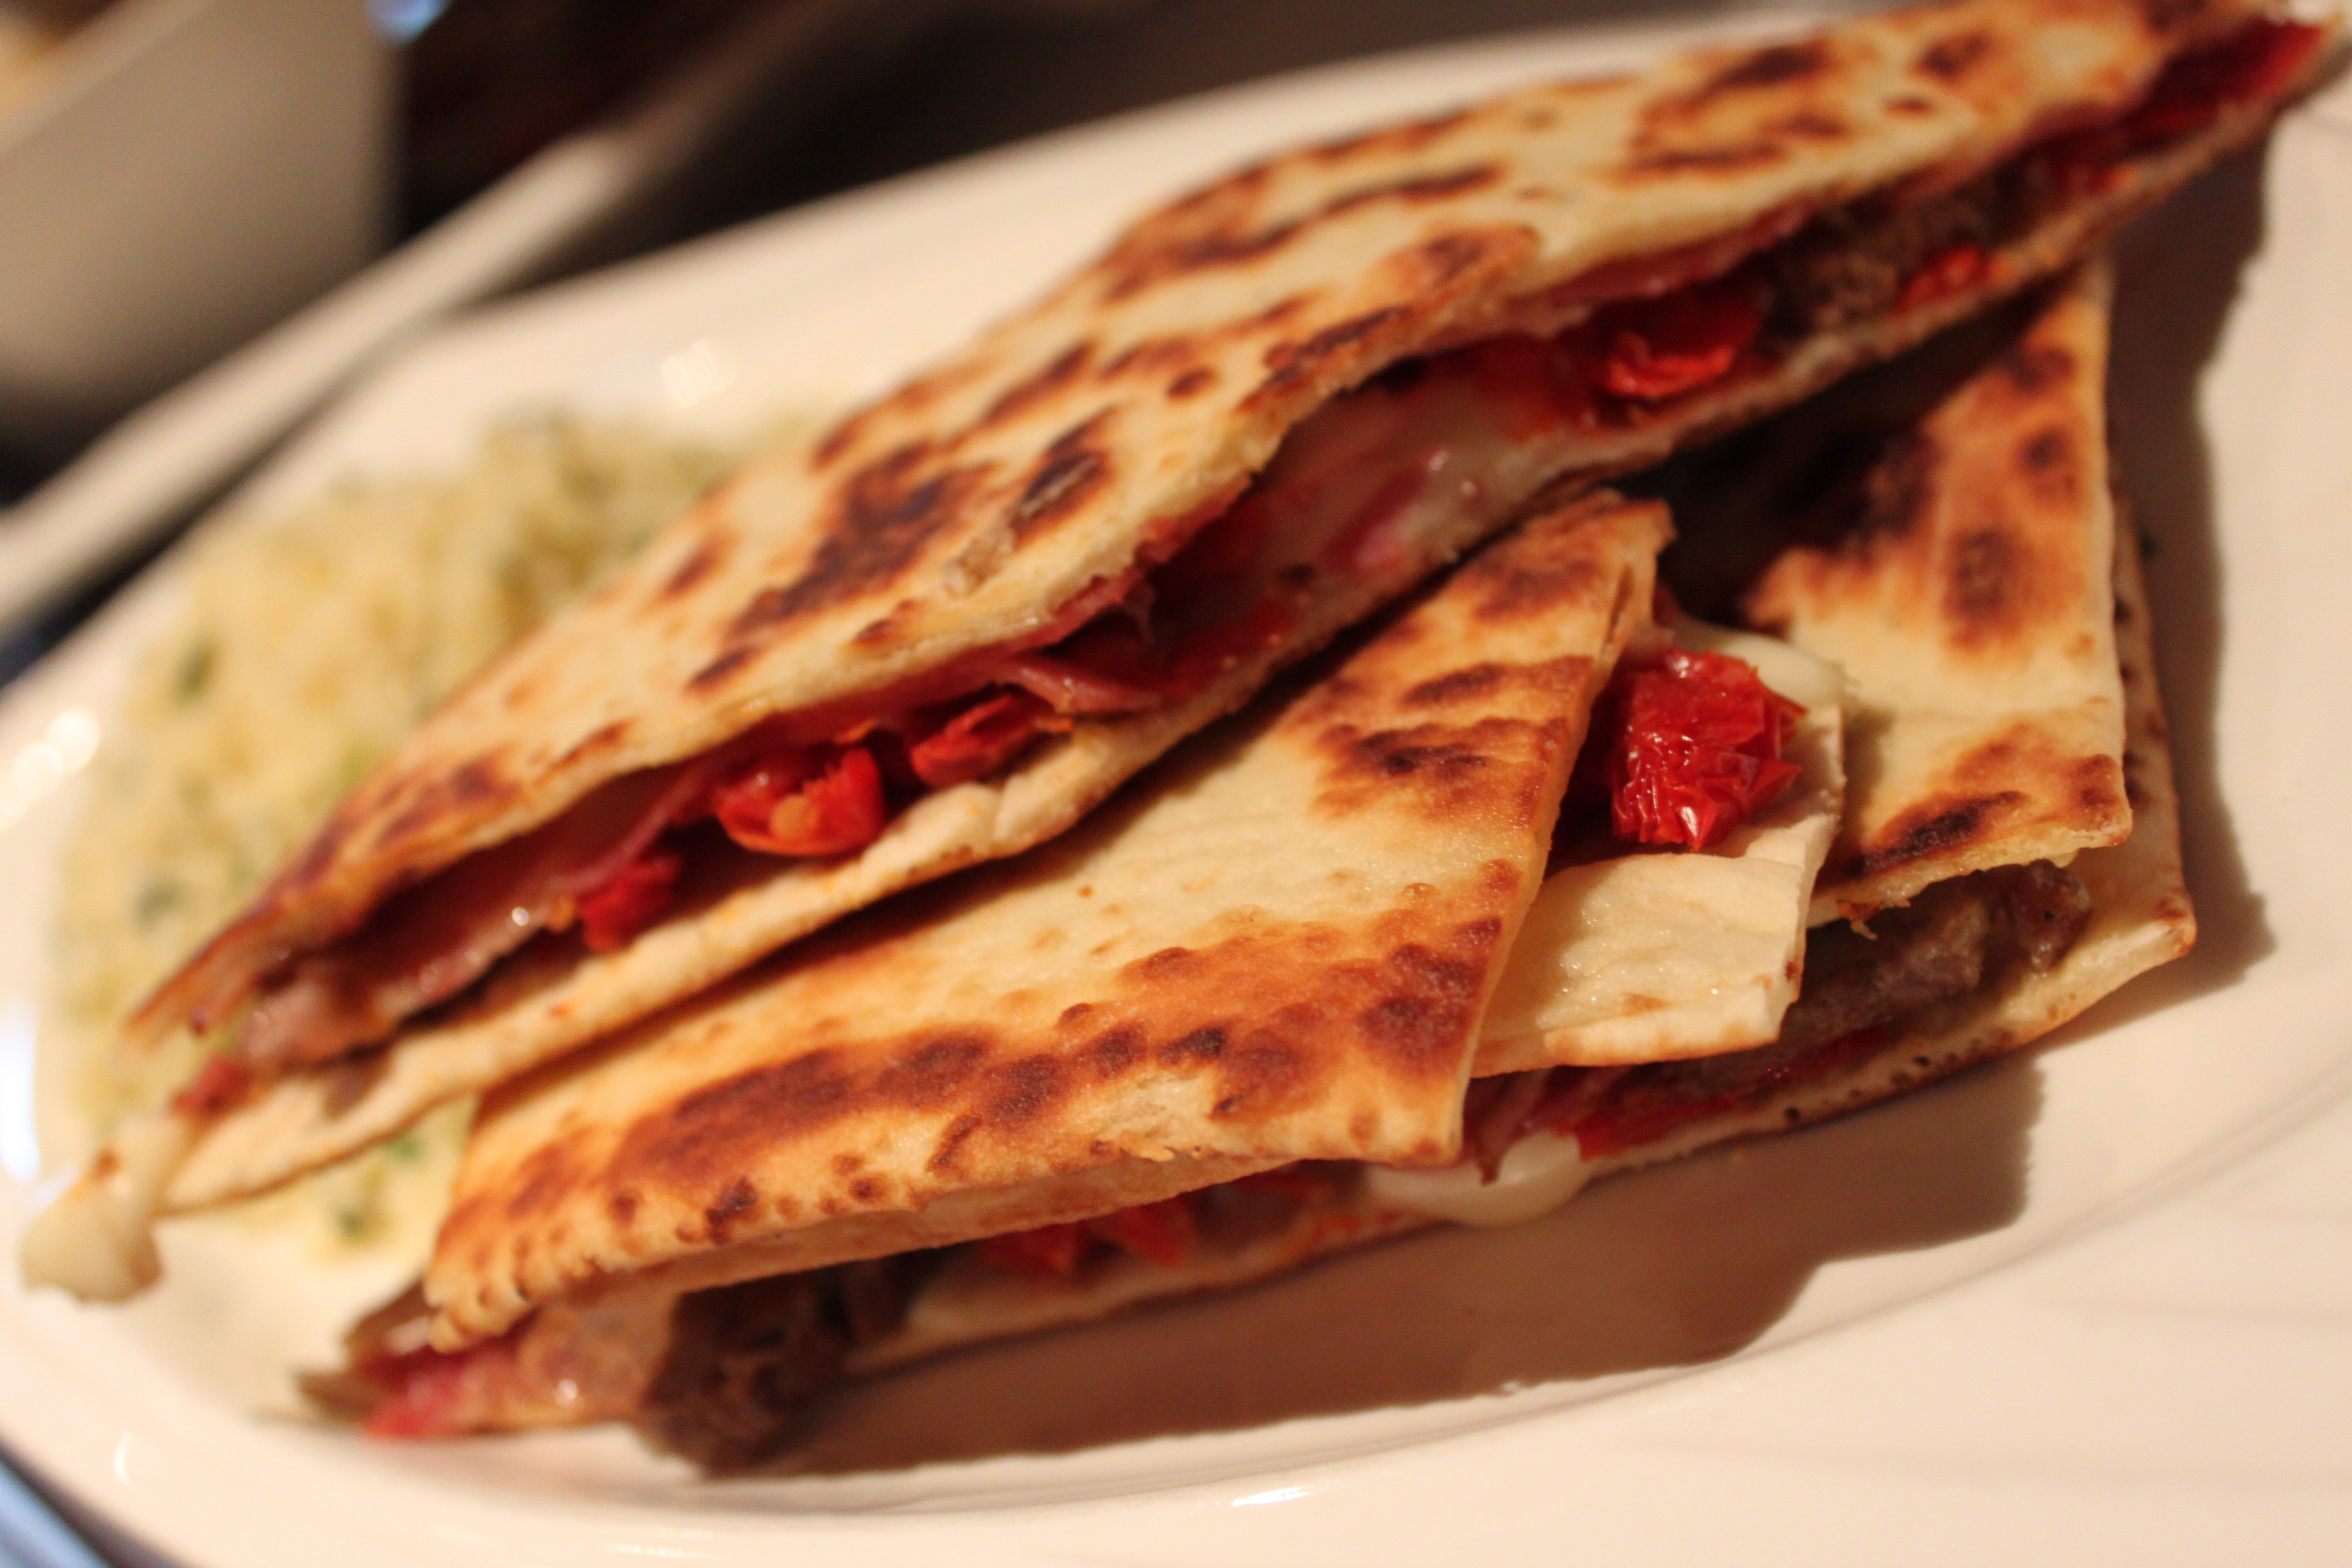 sausage roasted red pepper and mozzarella italian chicken panini grill ...